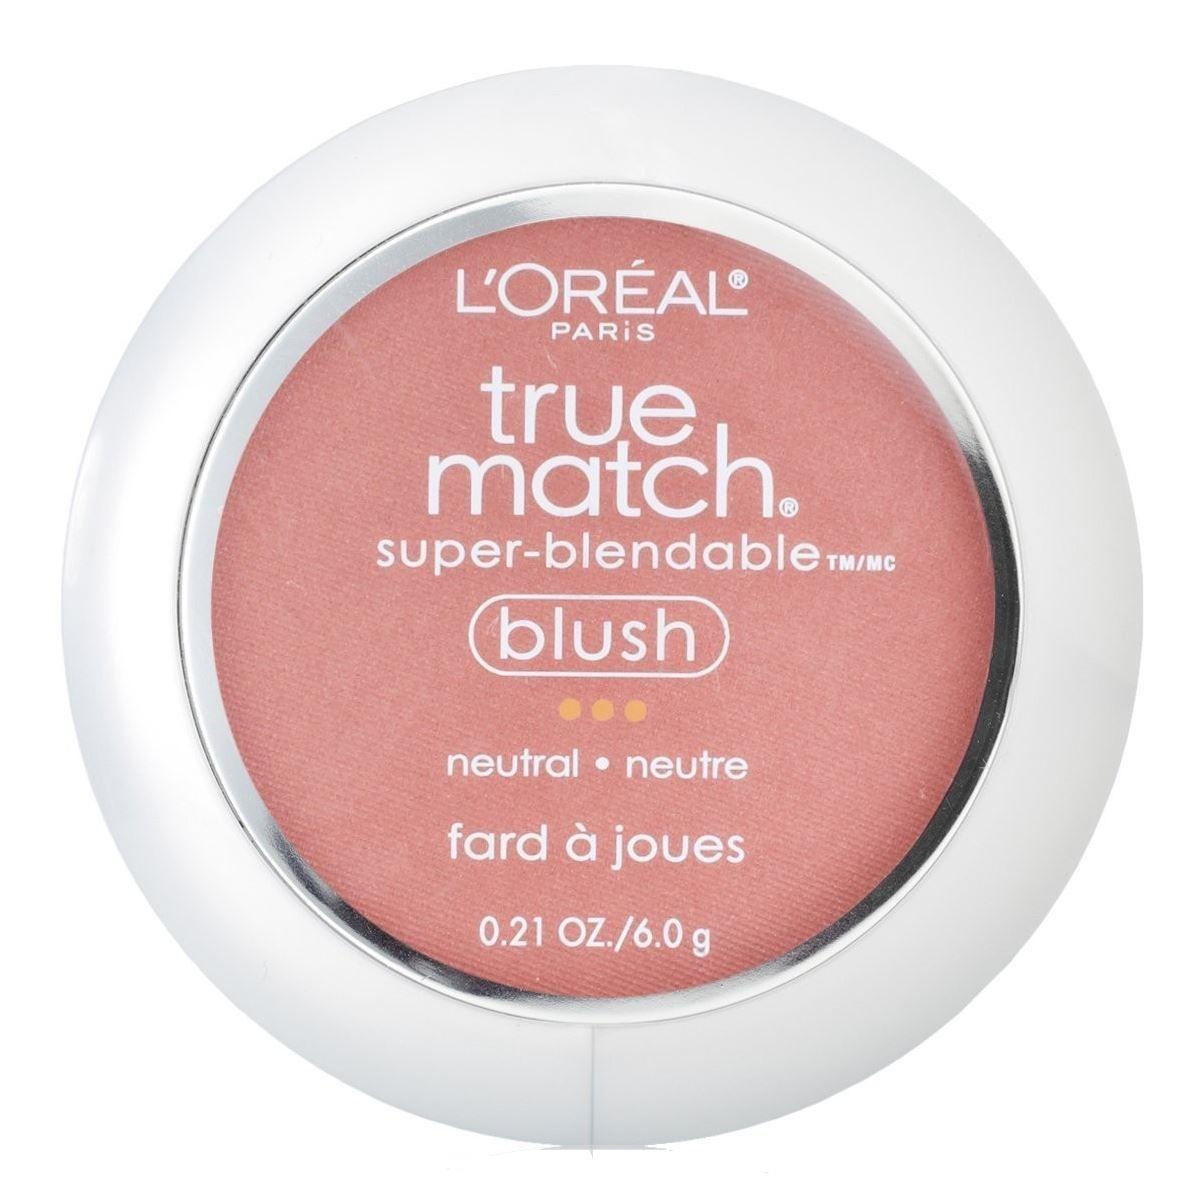 True Match Super-Blendable Blush